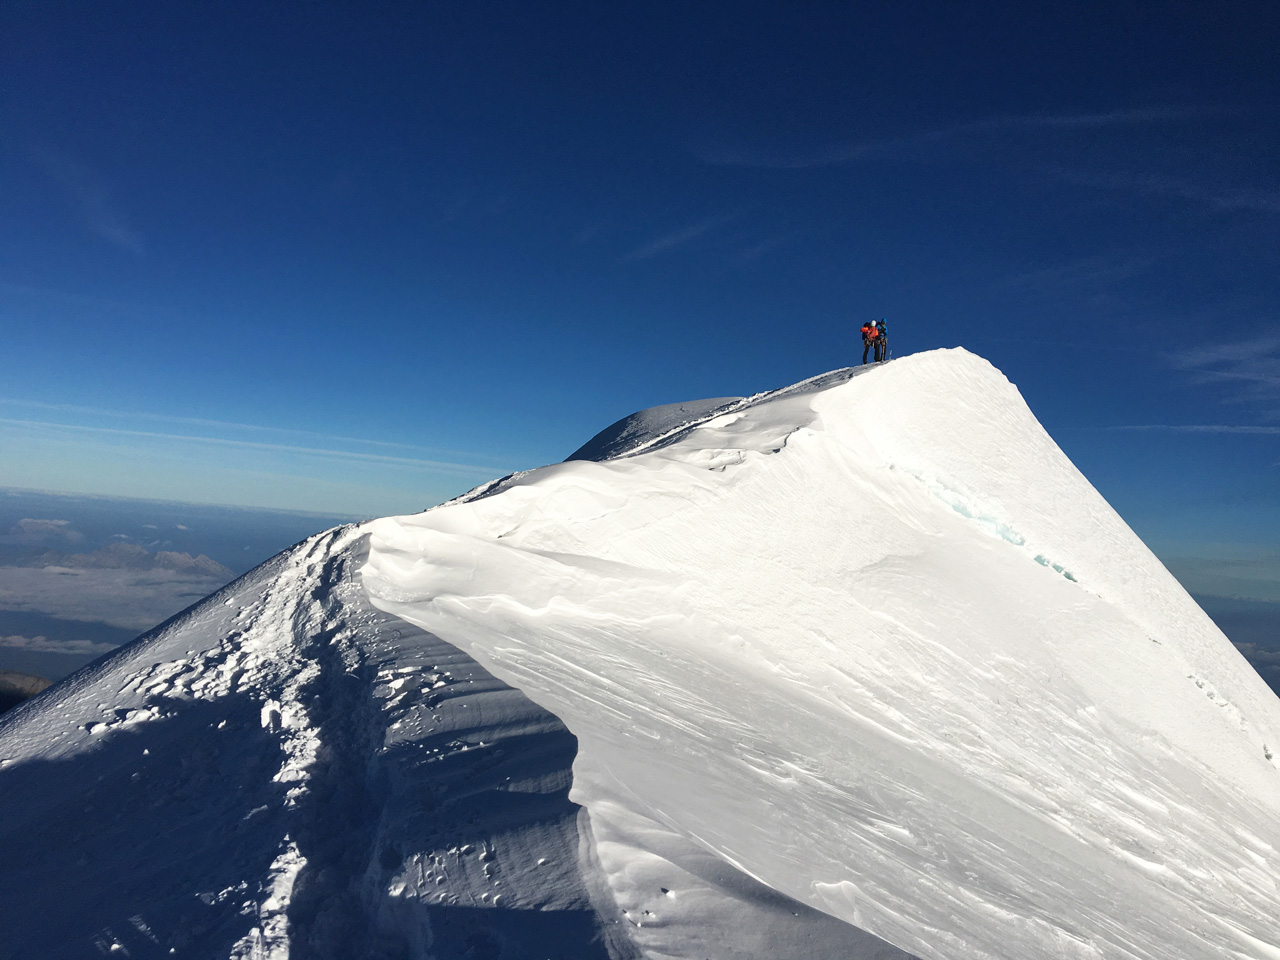 Antoine Labranche, Mont-Blanc, Alps, France, 2016